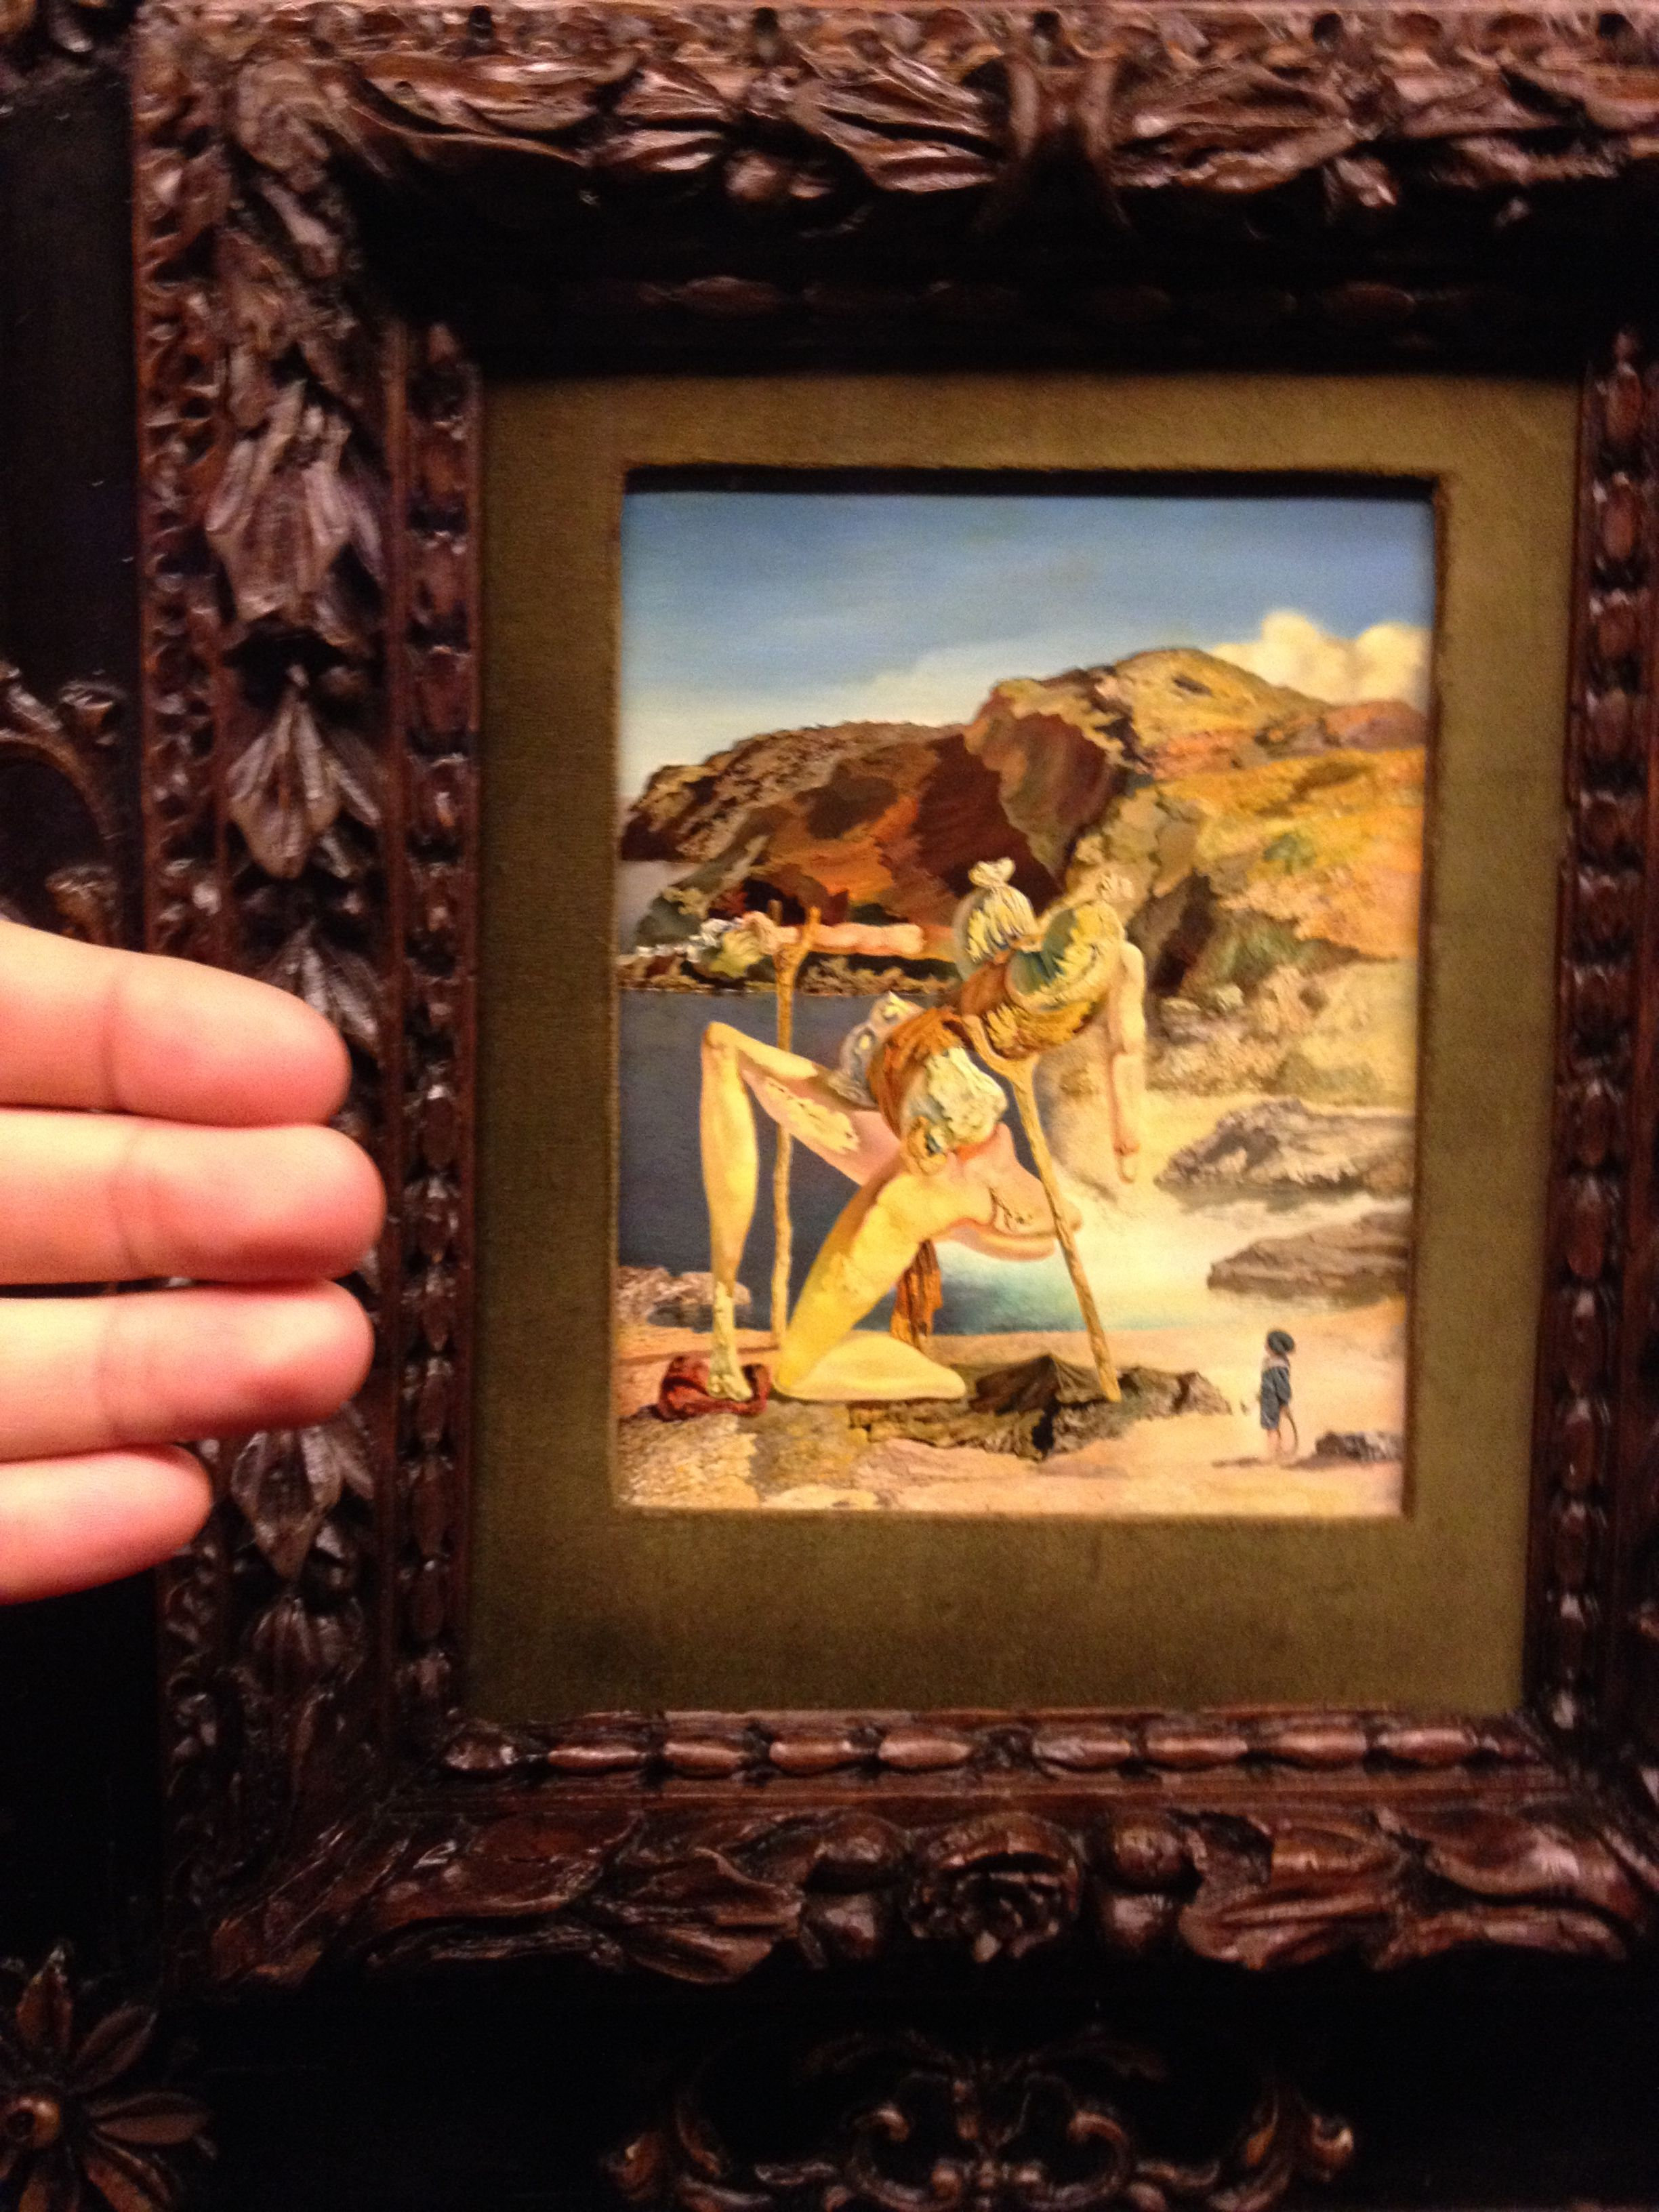 Teatro-Museo Dalí - Figueras Jan2014